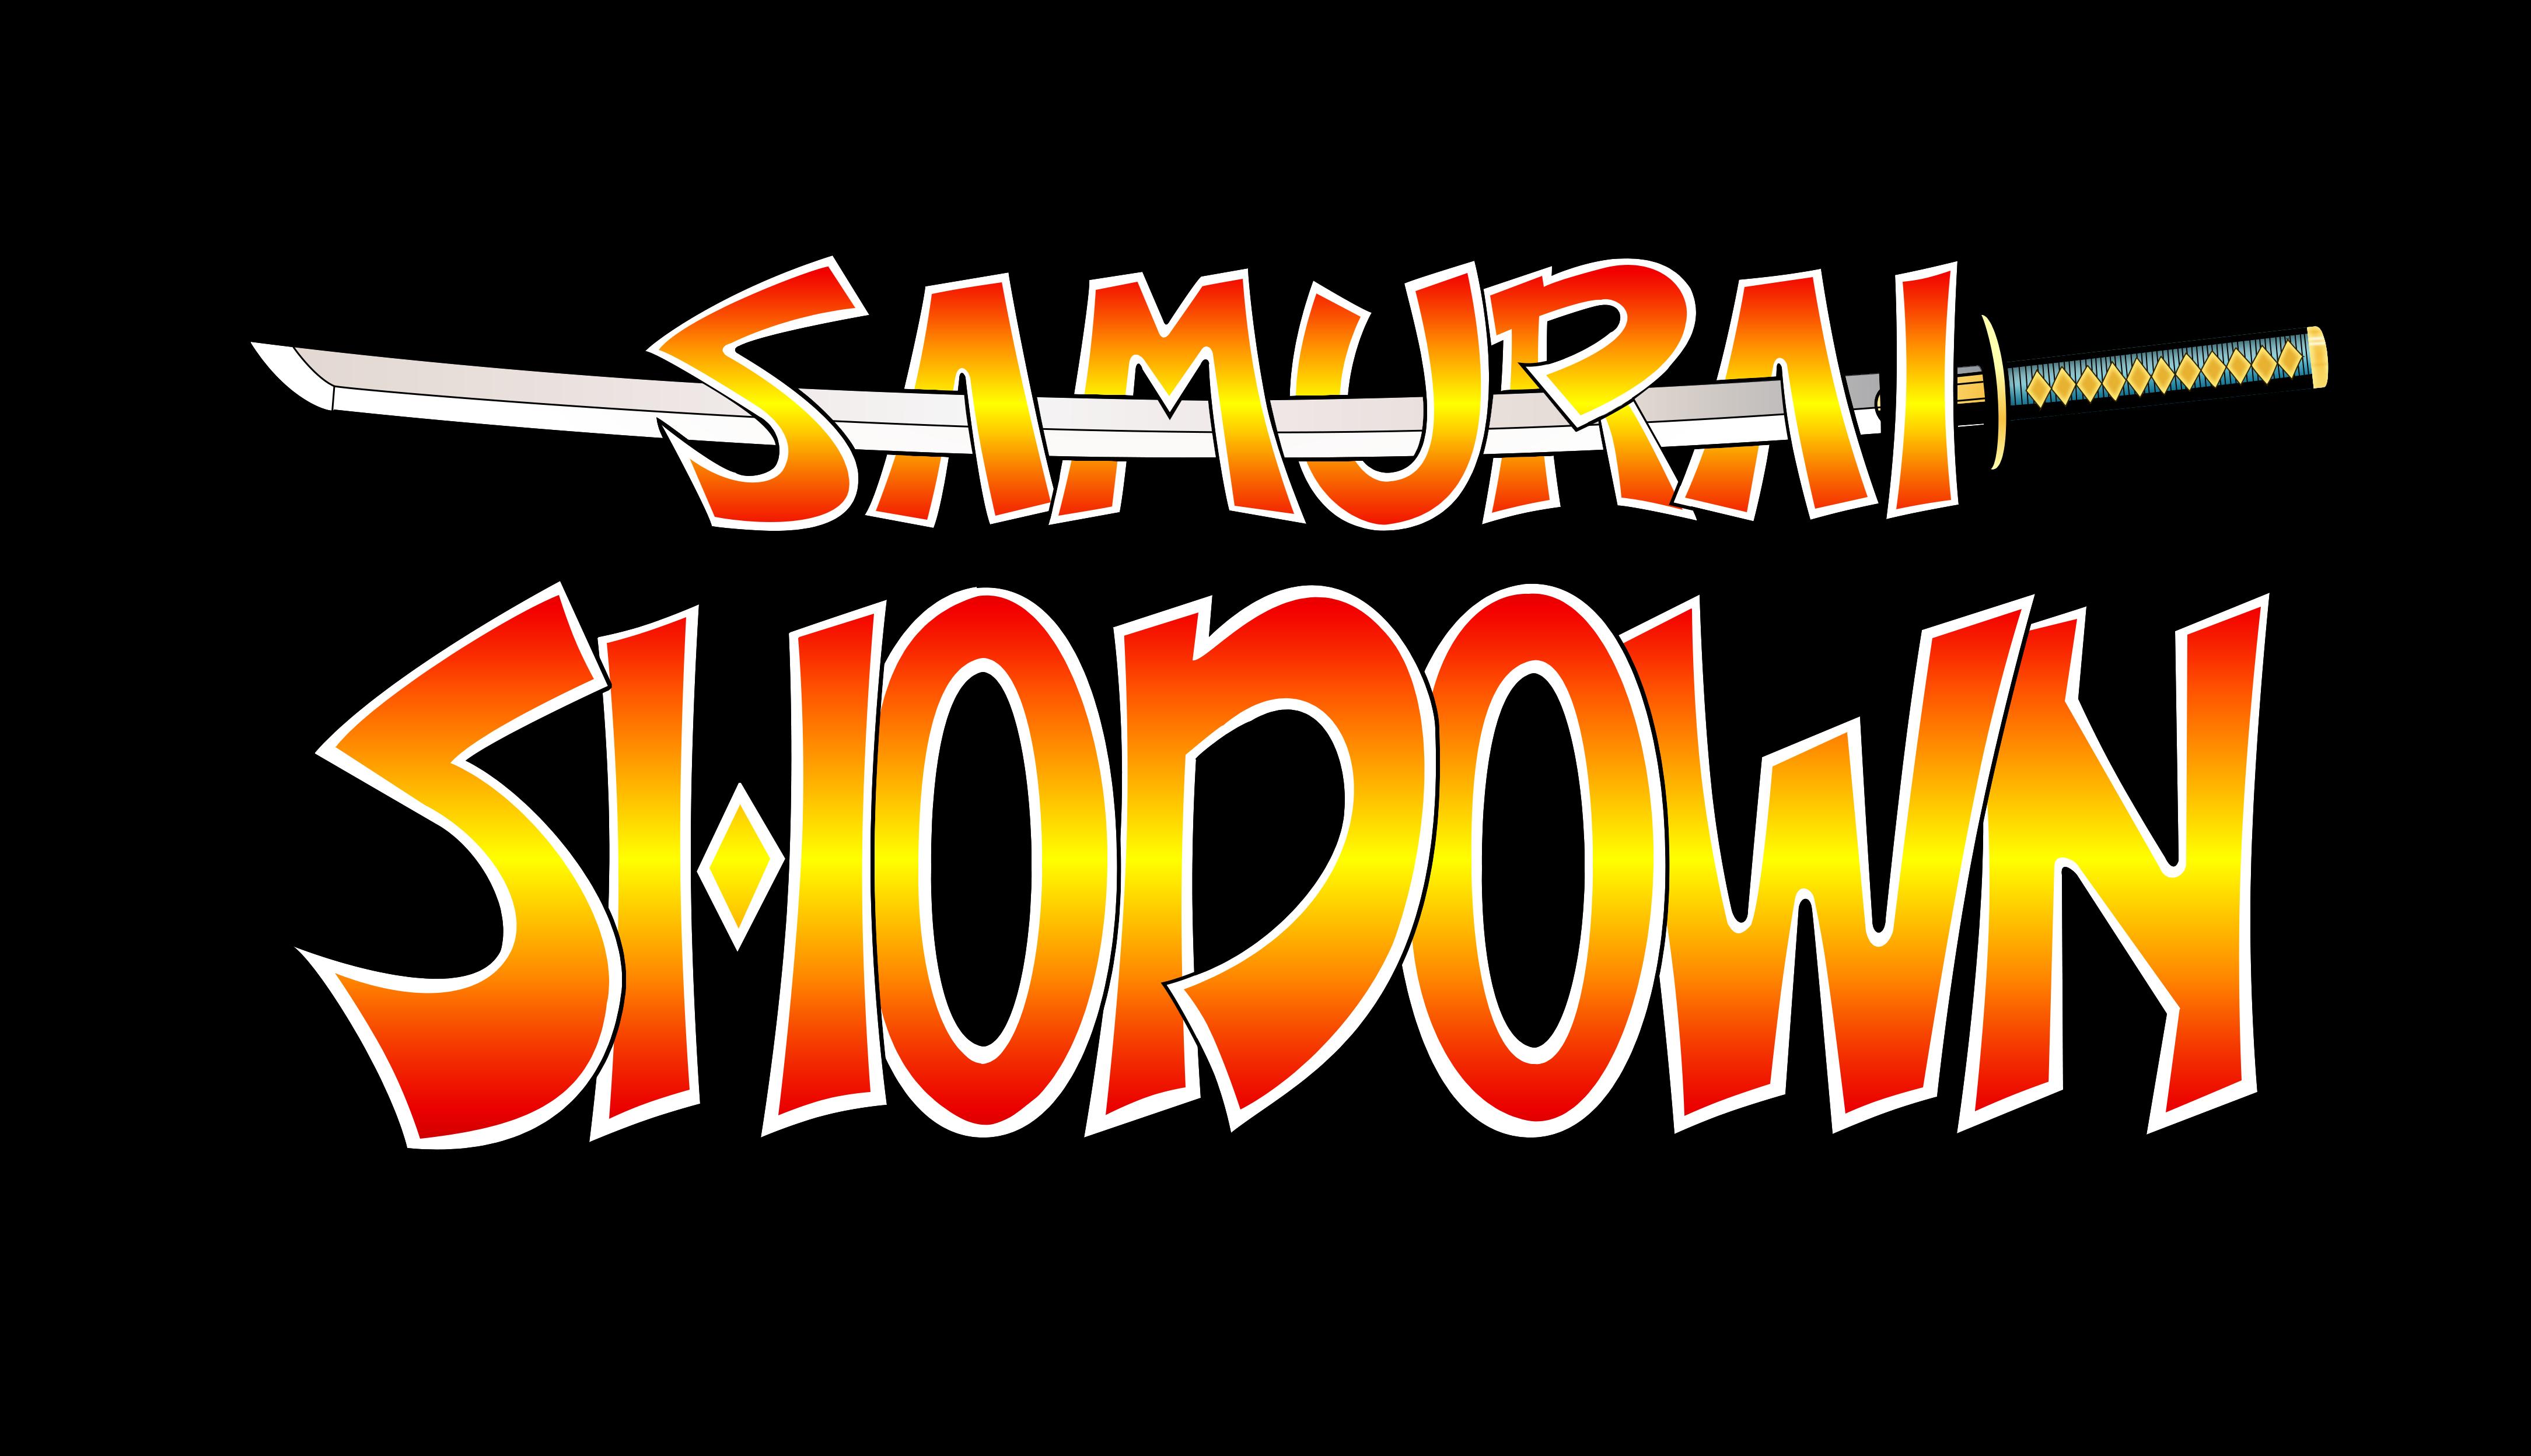 Samurai Shodown – Frases e mensagens